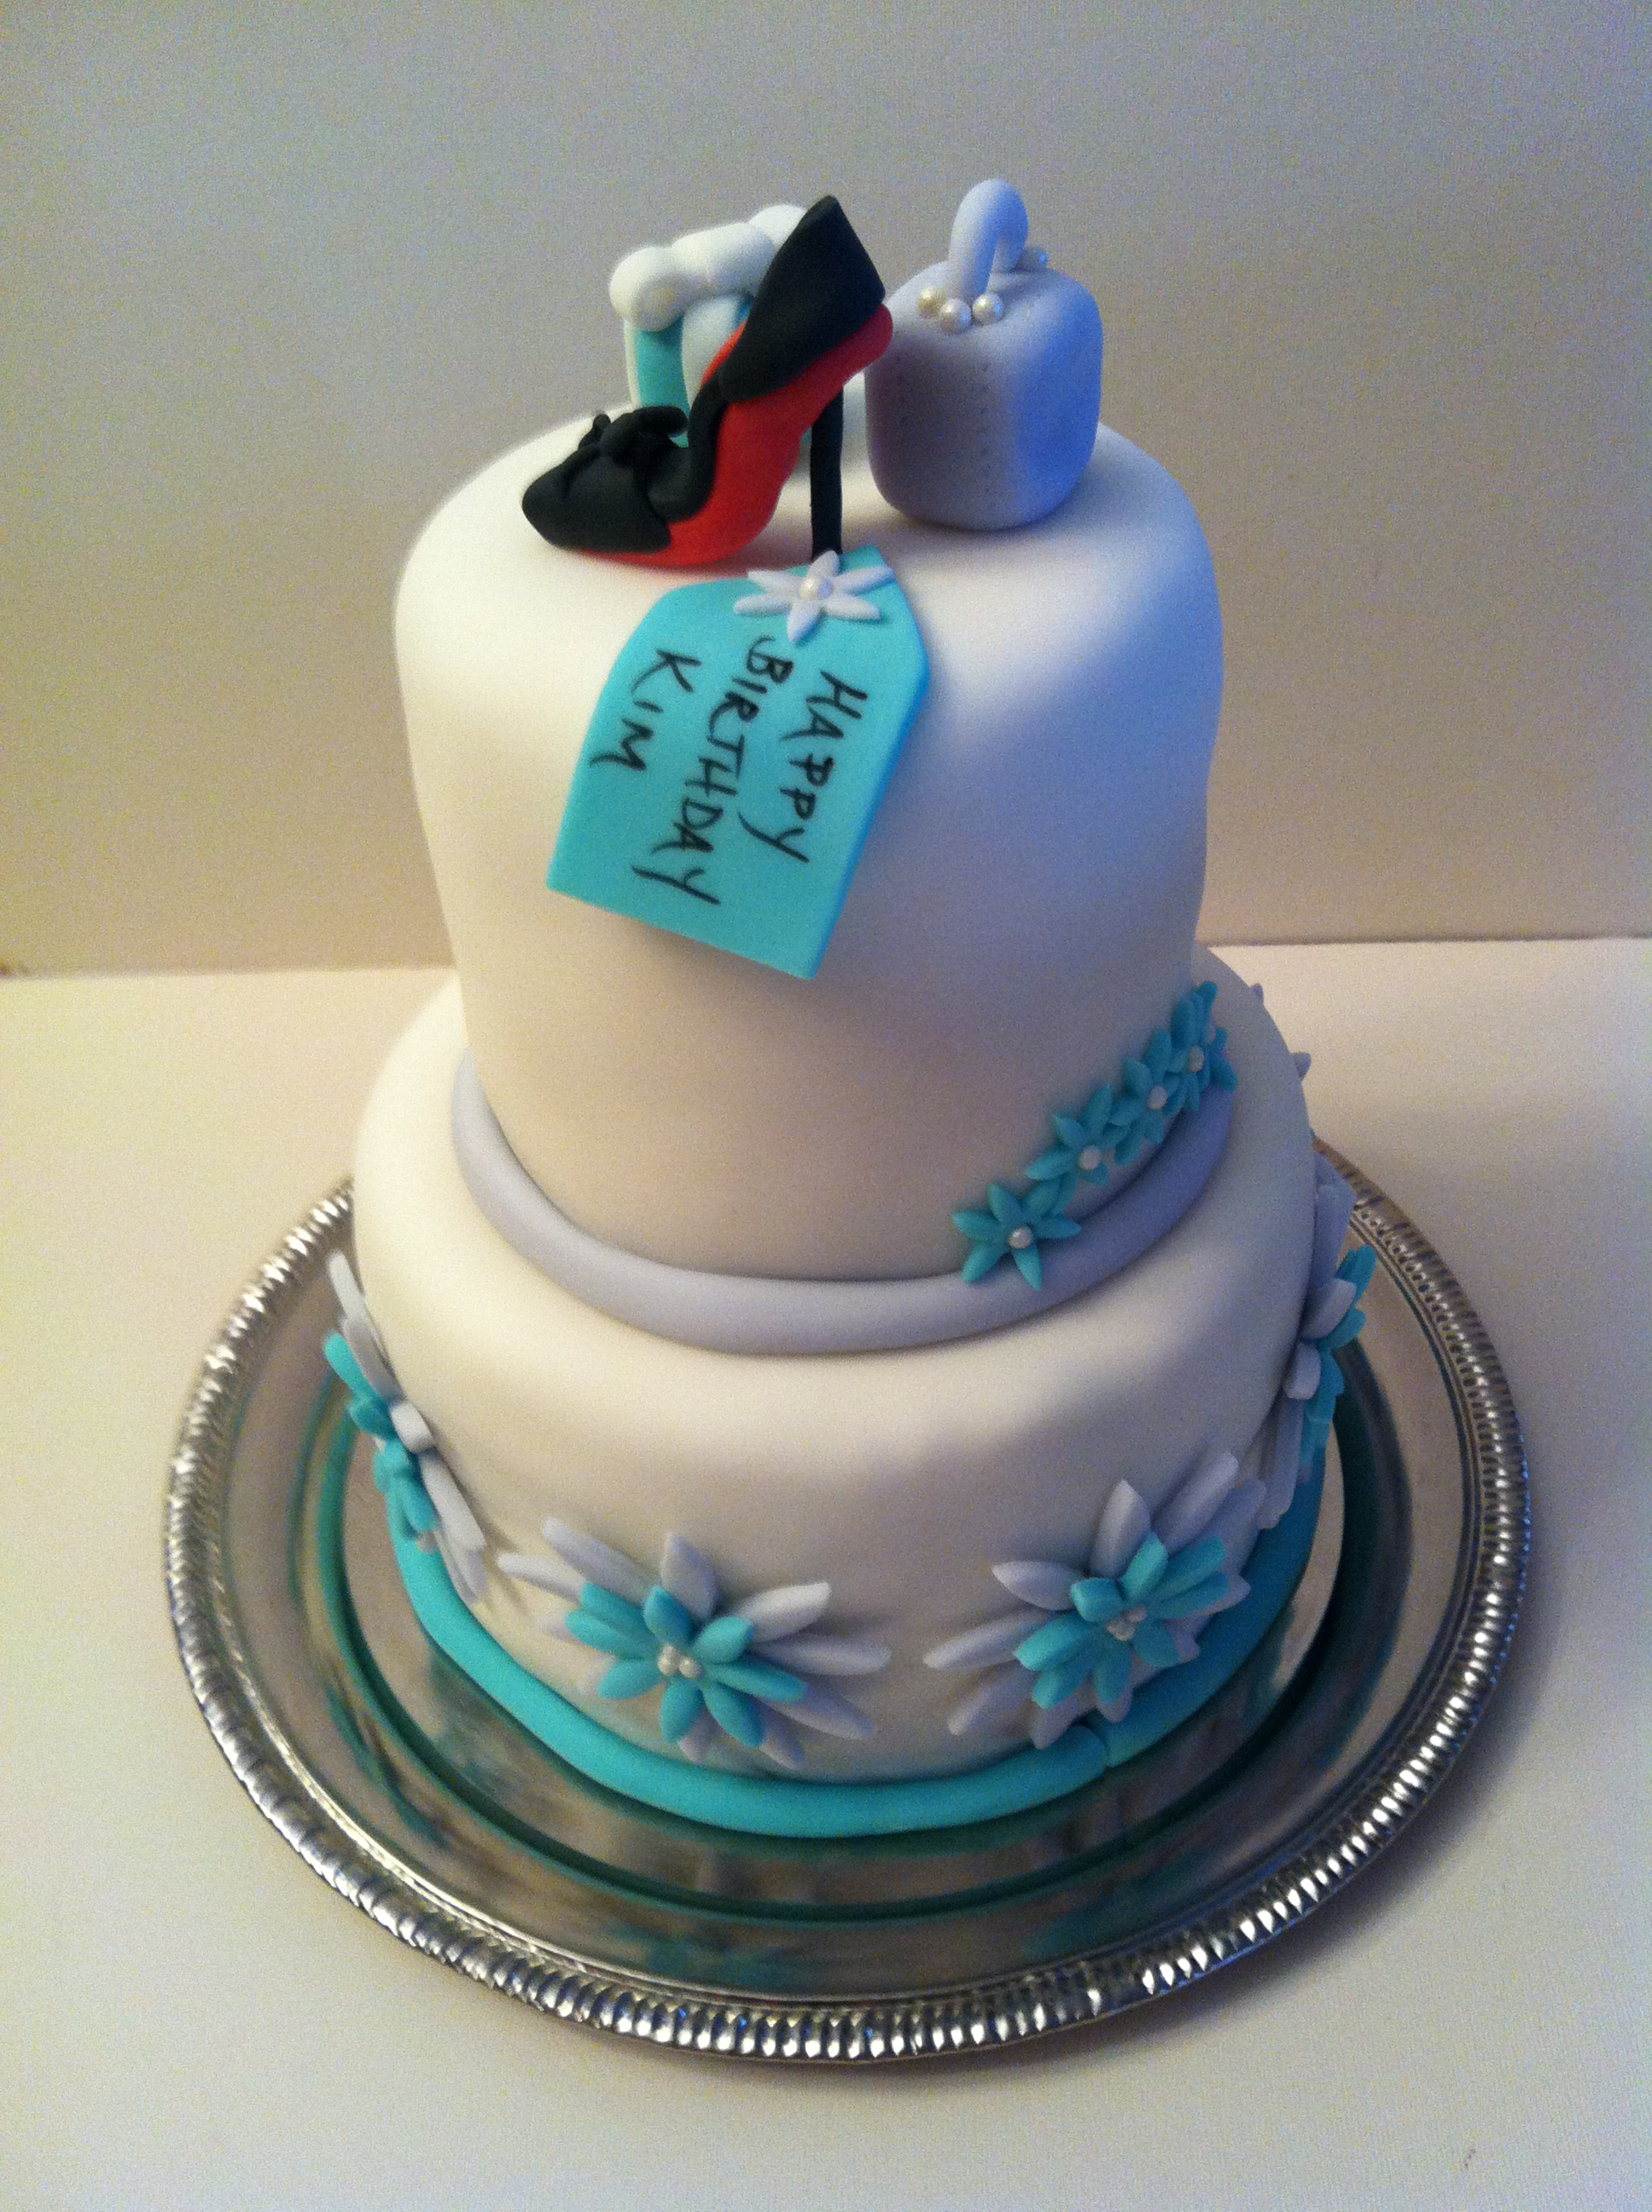 Happy Birthdaycakewith Name Edit